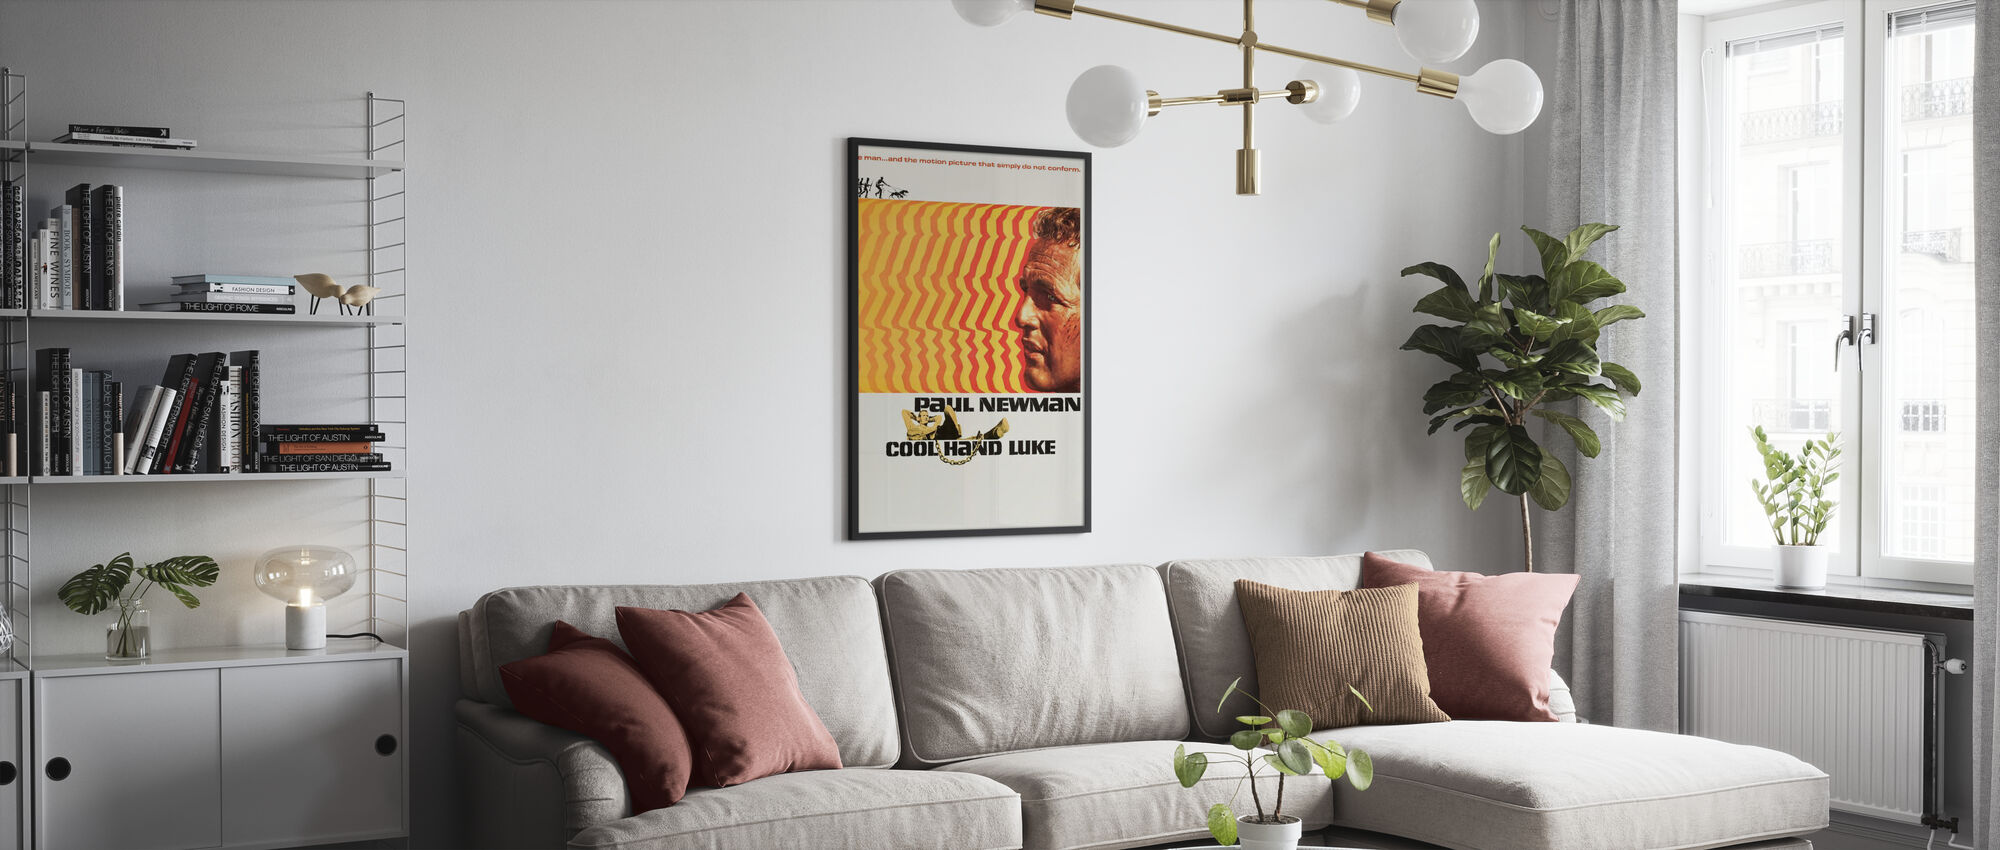 Koele Hand Luke - Poster - Woonkamer